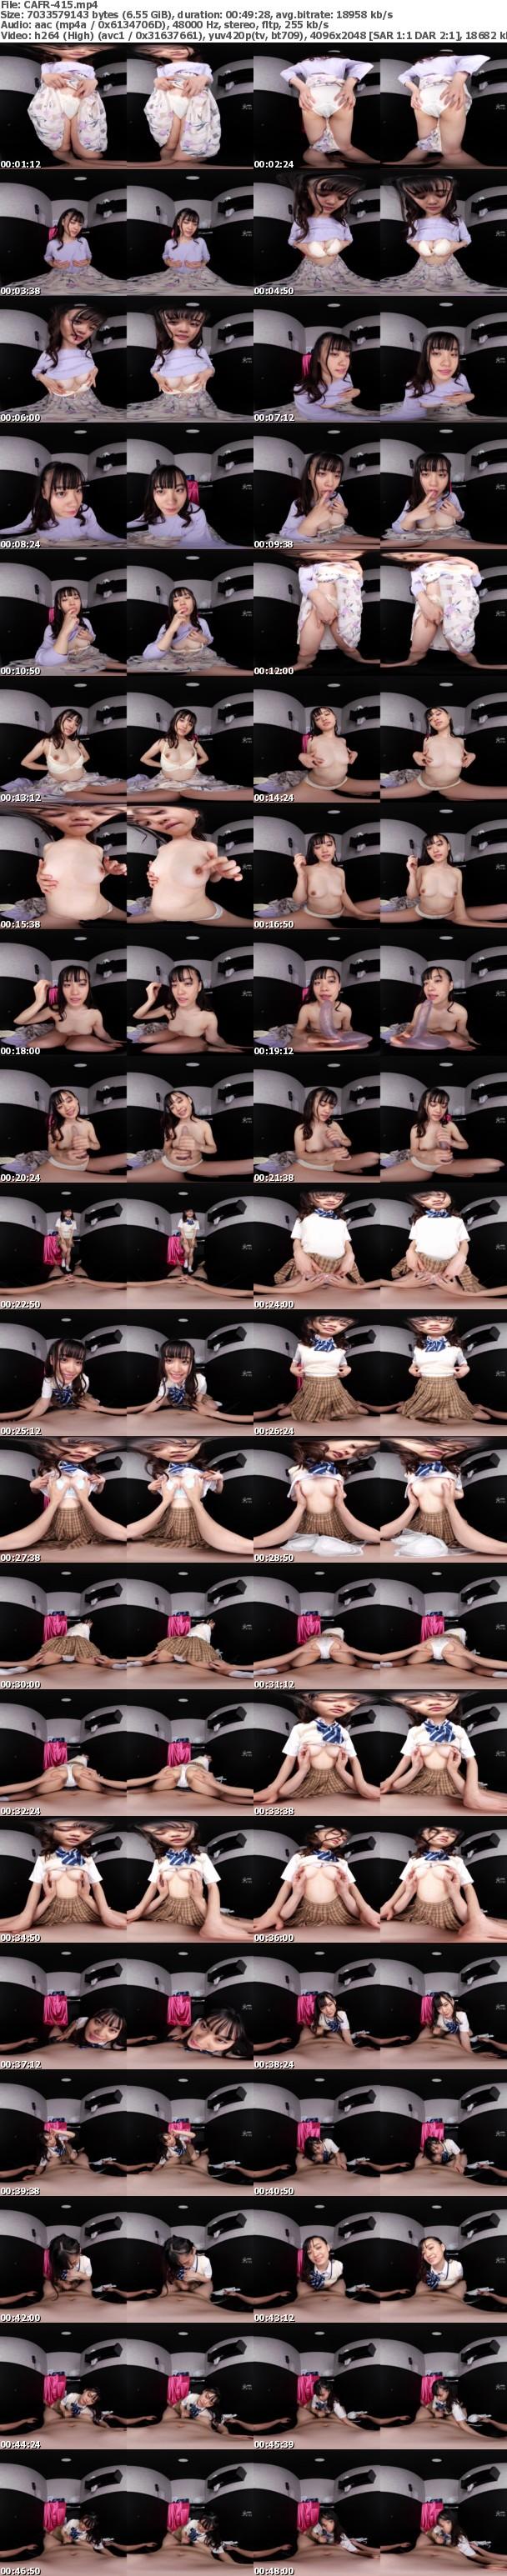 (VR) CAFR-415 都内某オナクラ店のオナサポ制服美少女~あなたを絶頂へと導く淫語とヌキテクによる極上センズリナビゲート~花音うらら